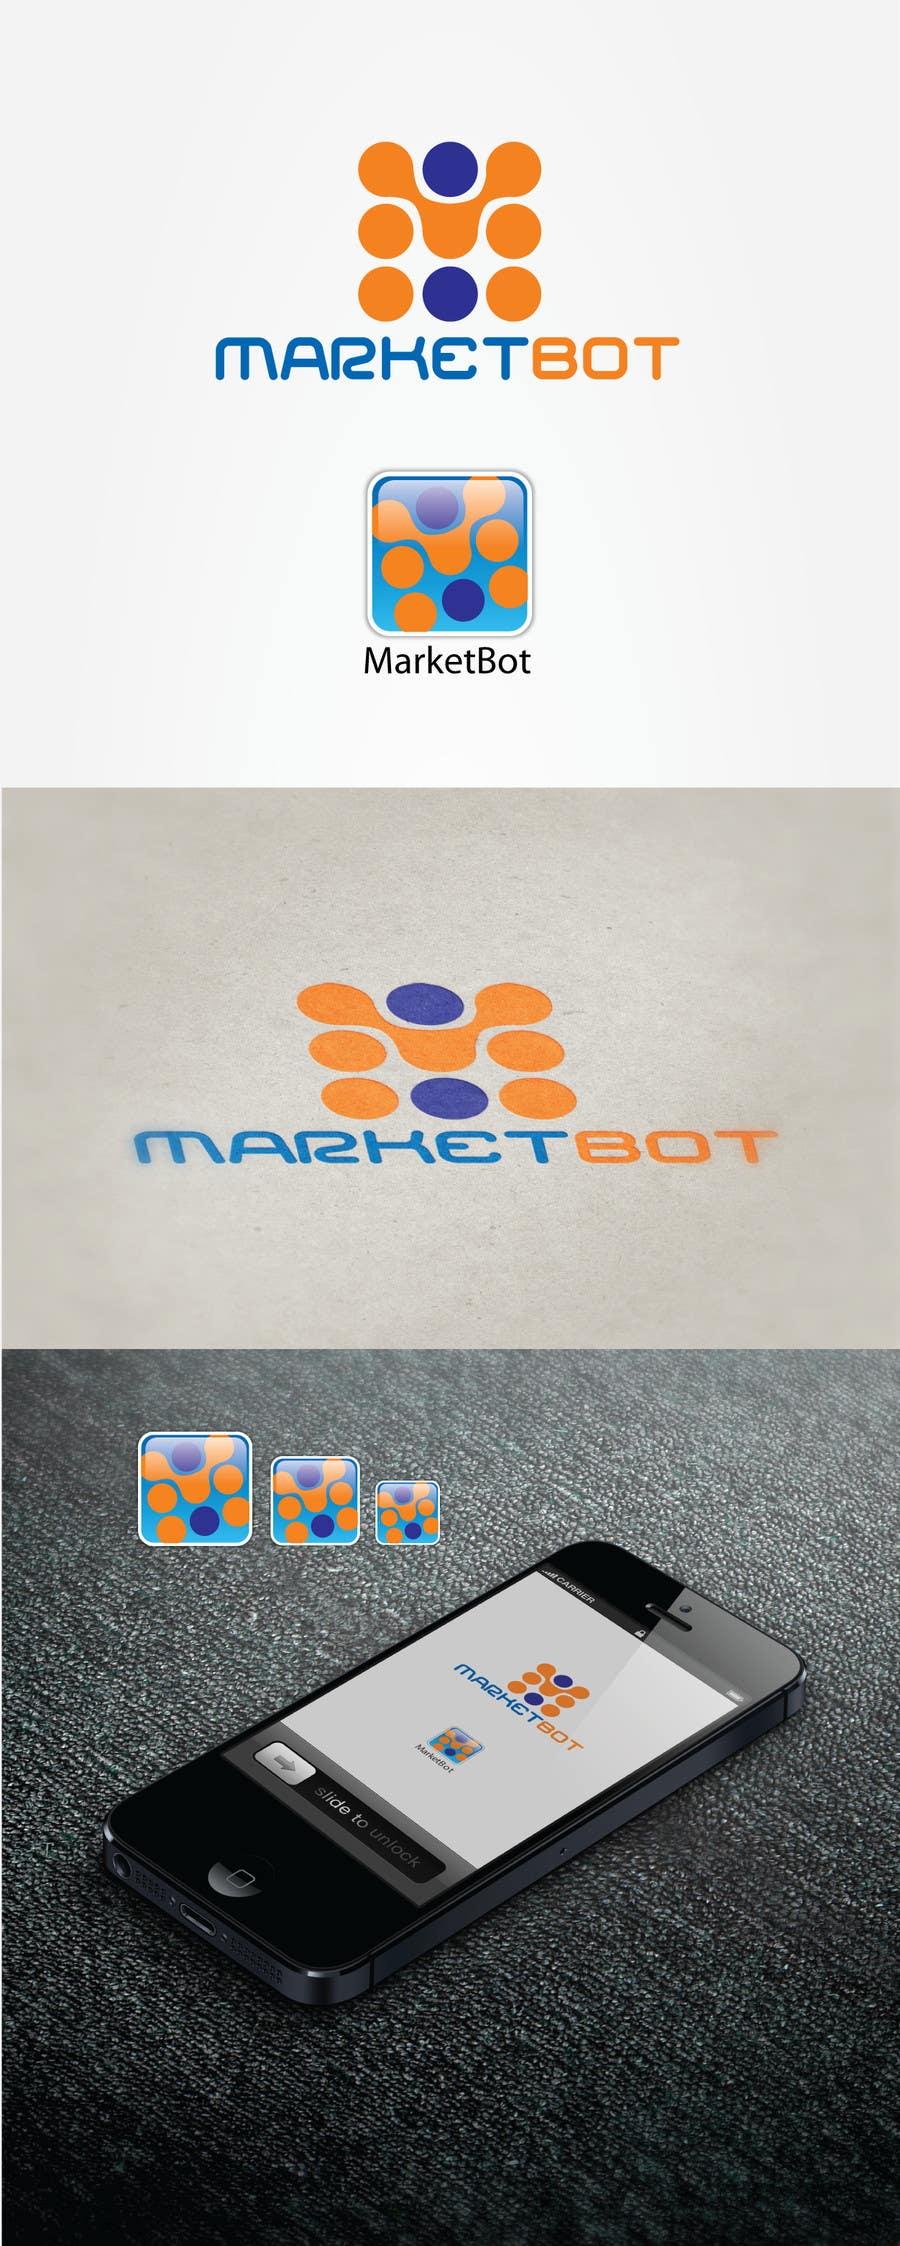 Bài tham dự cuộc thi #8 cho Design a Logo for our website application